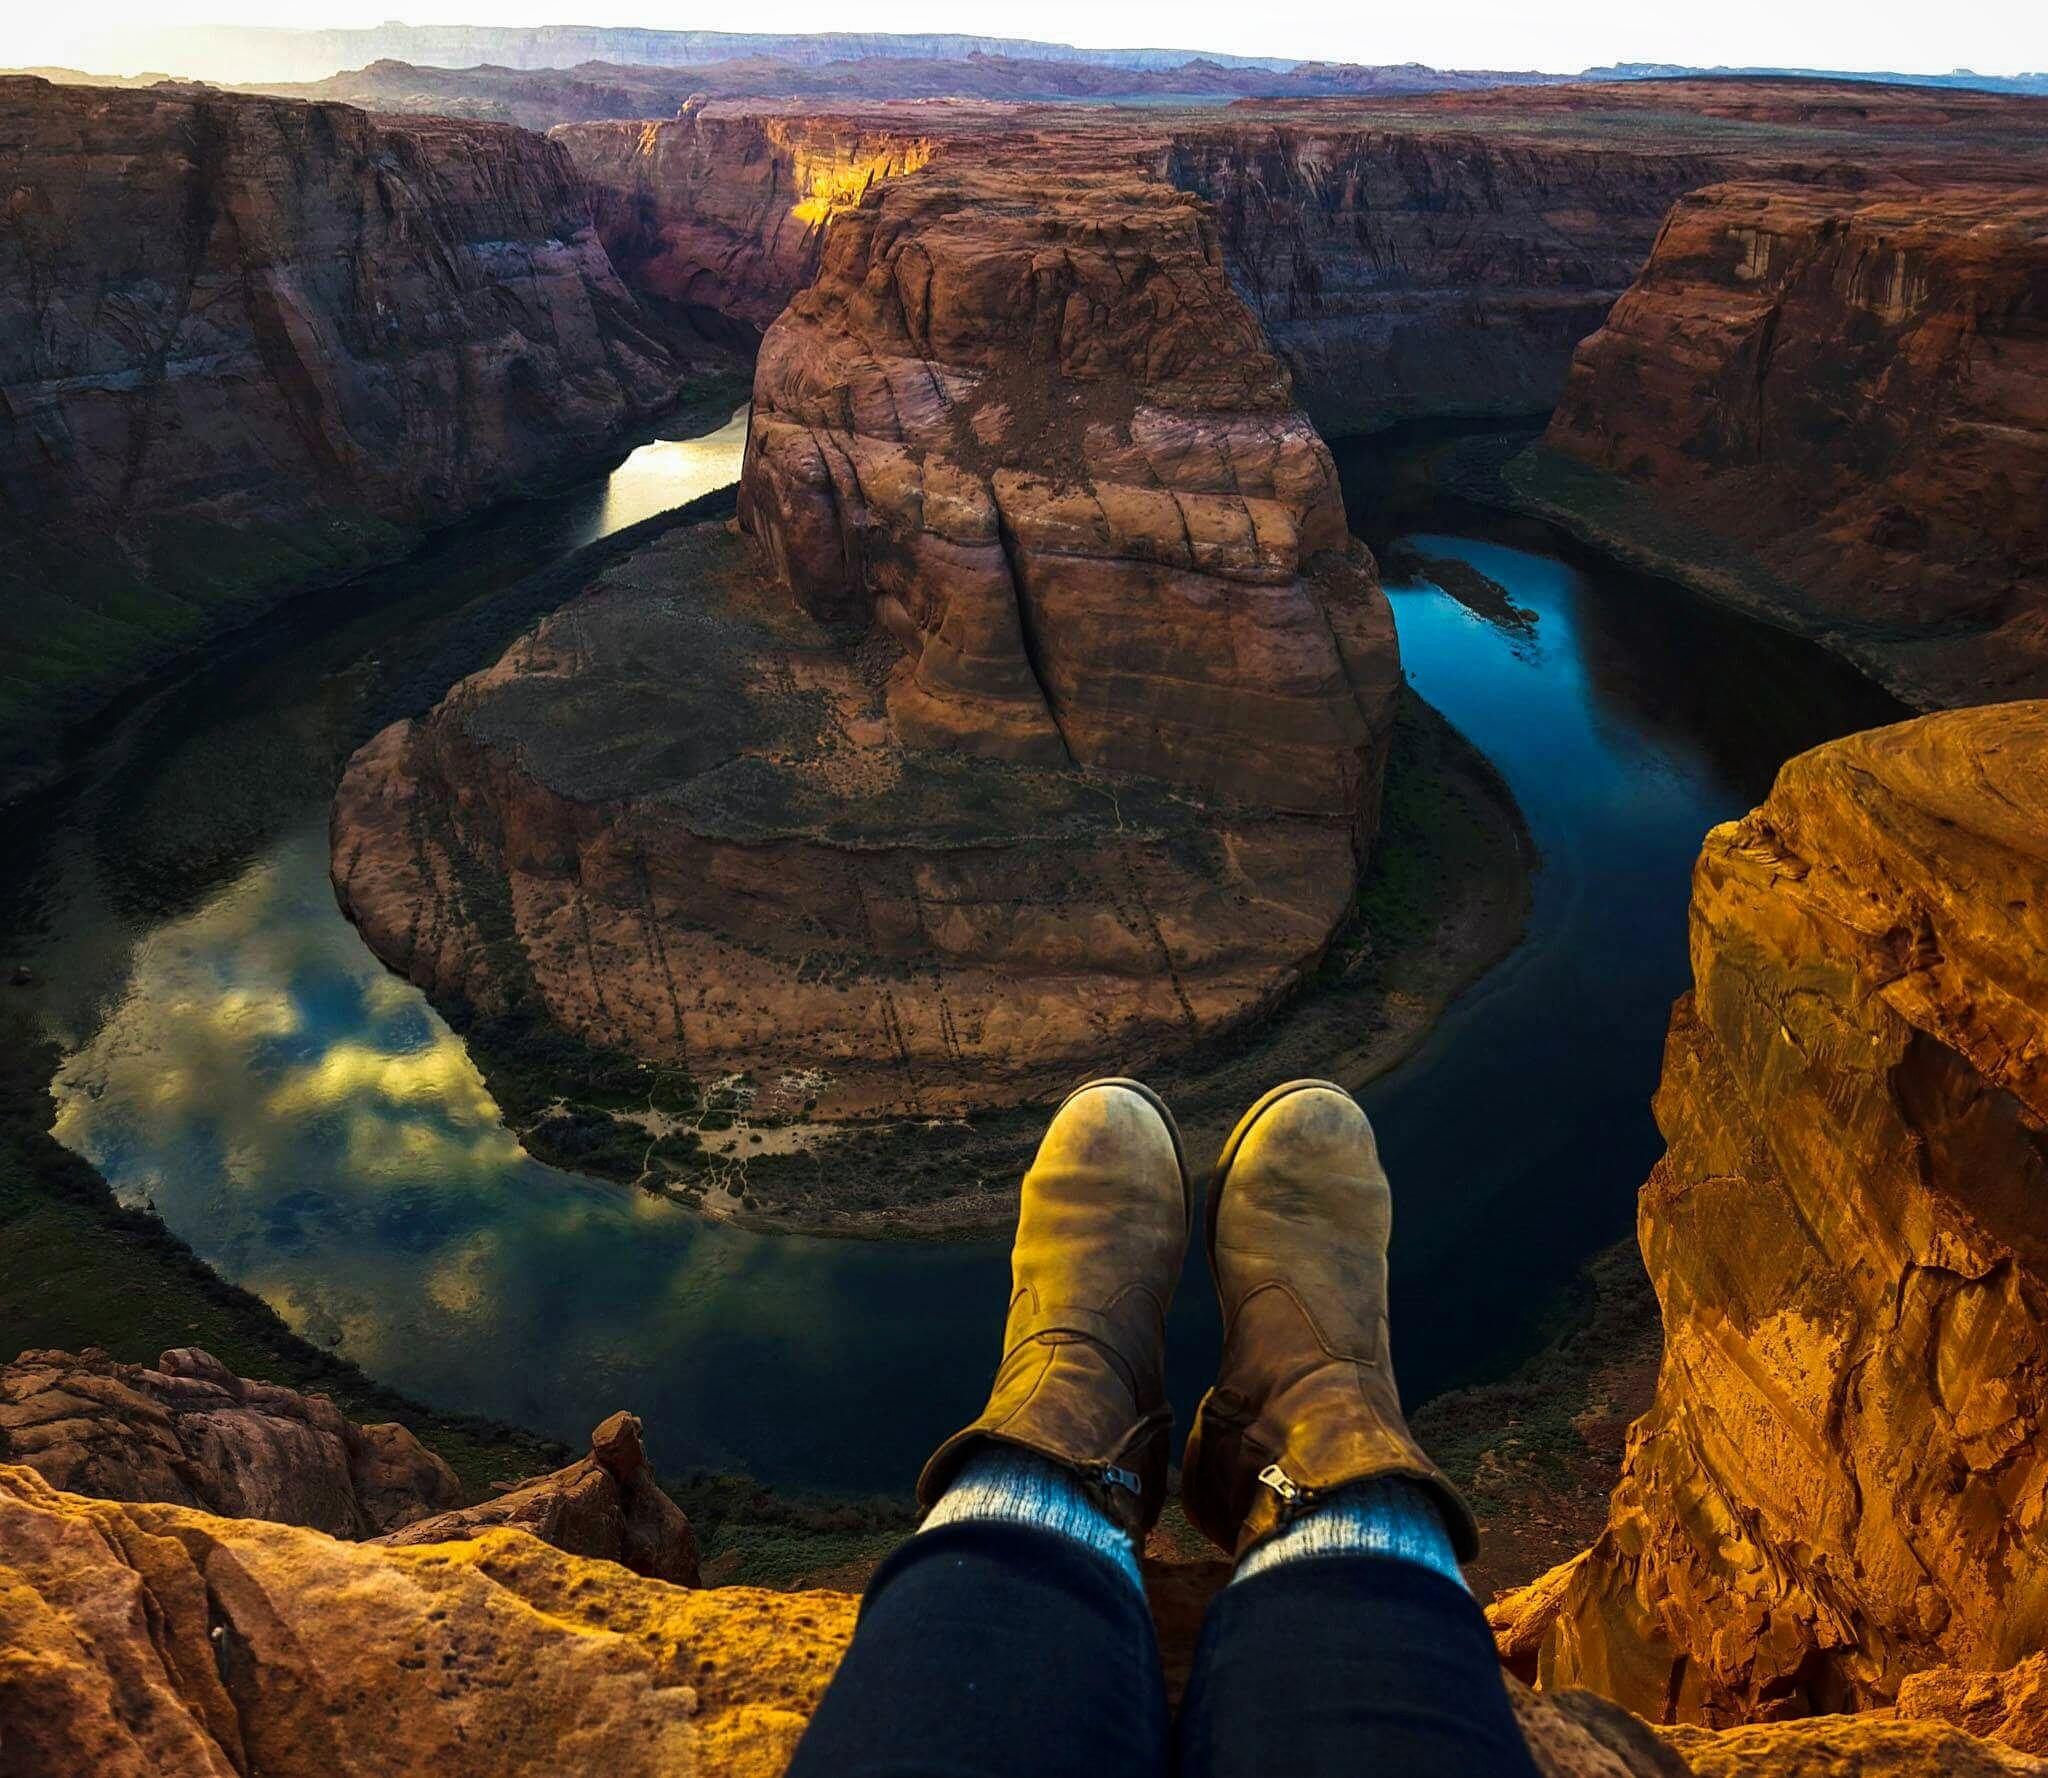 Horseshoe Bend - Top Five National Parks